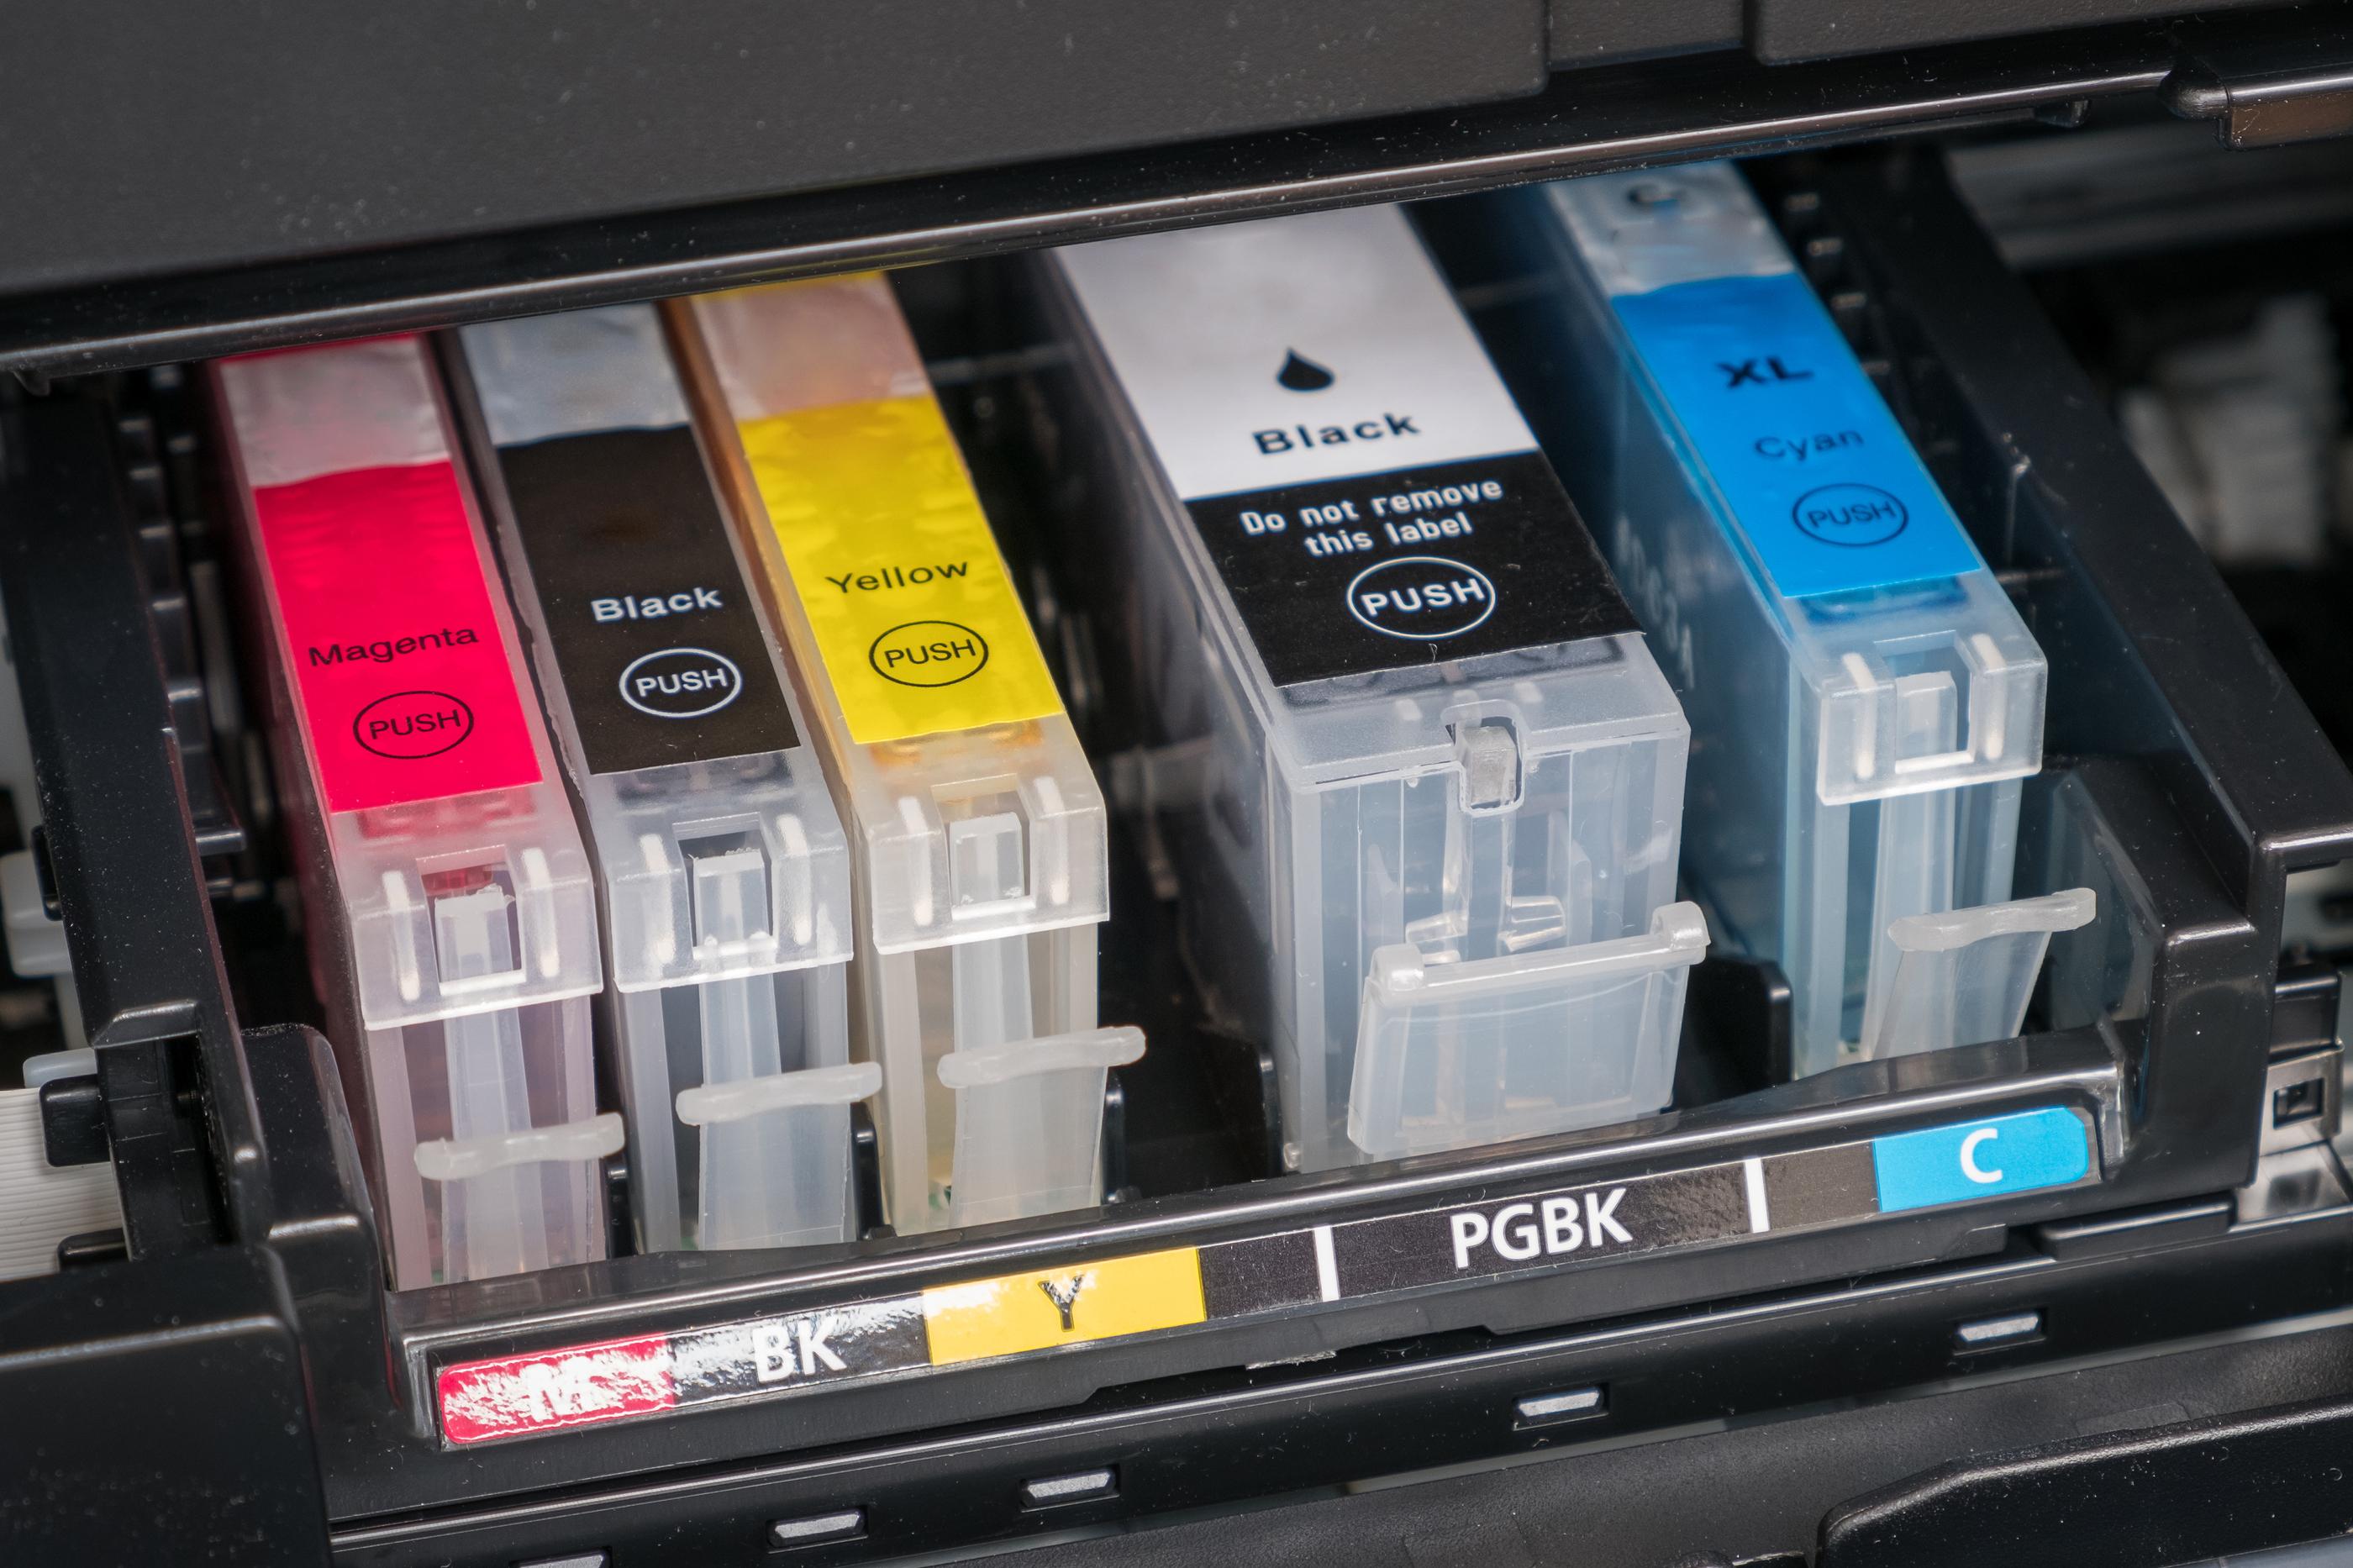 Ink Cartridges in a printer